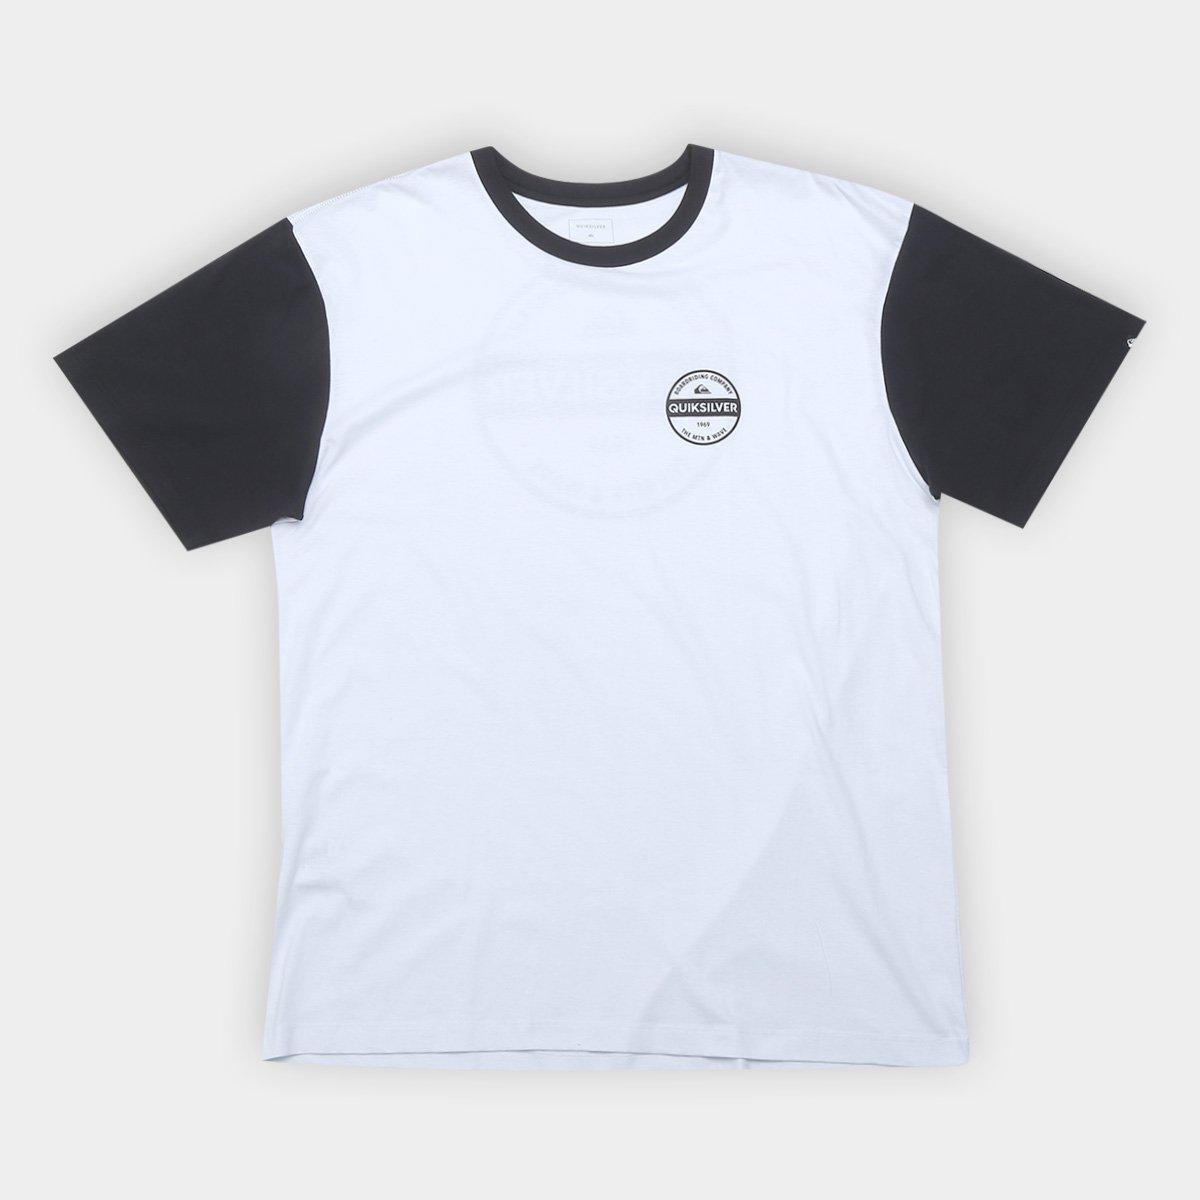 5af08559b0017 Camiseta Plus Size Quiksilver Basic Masculina - Compre Agora